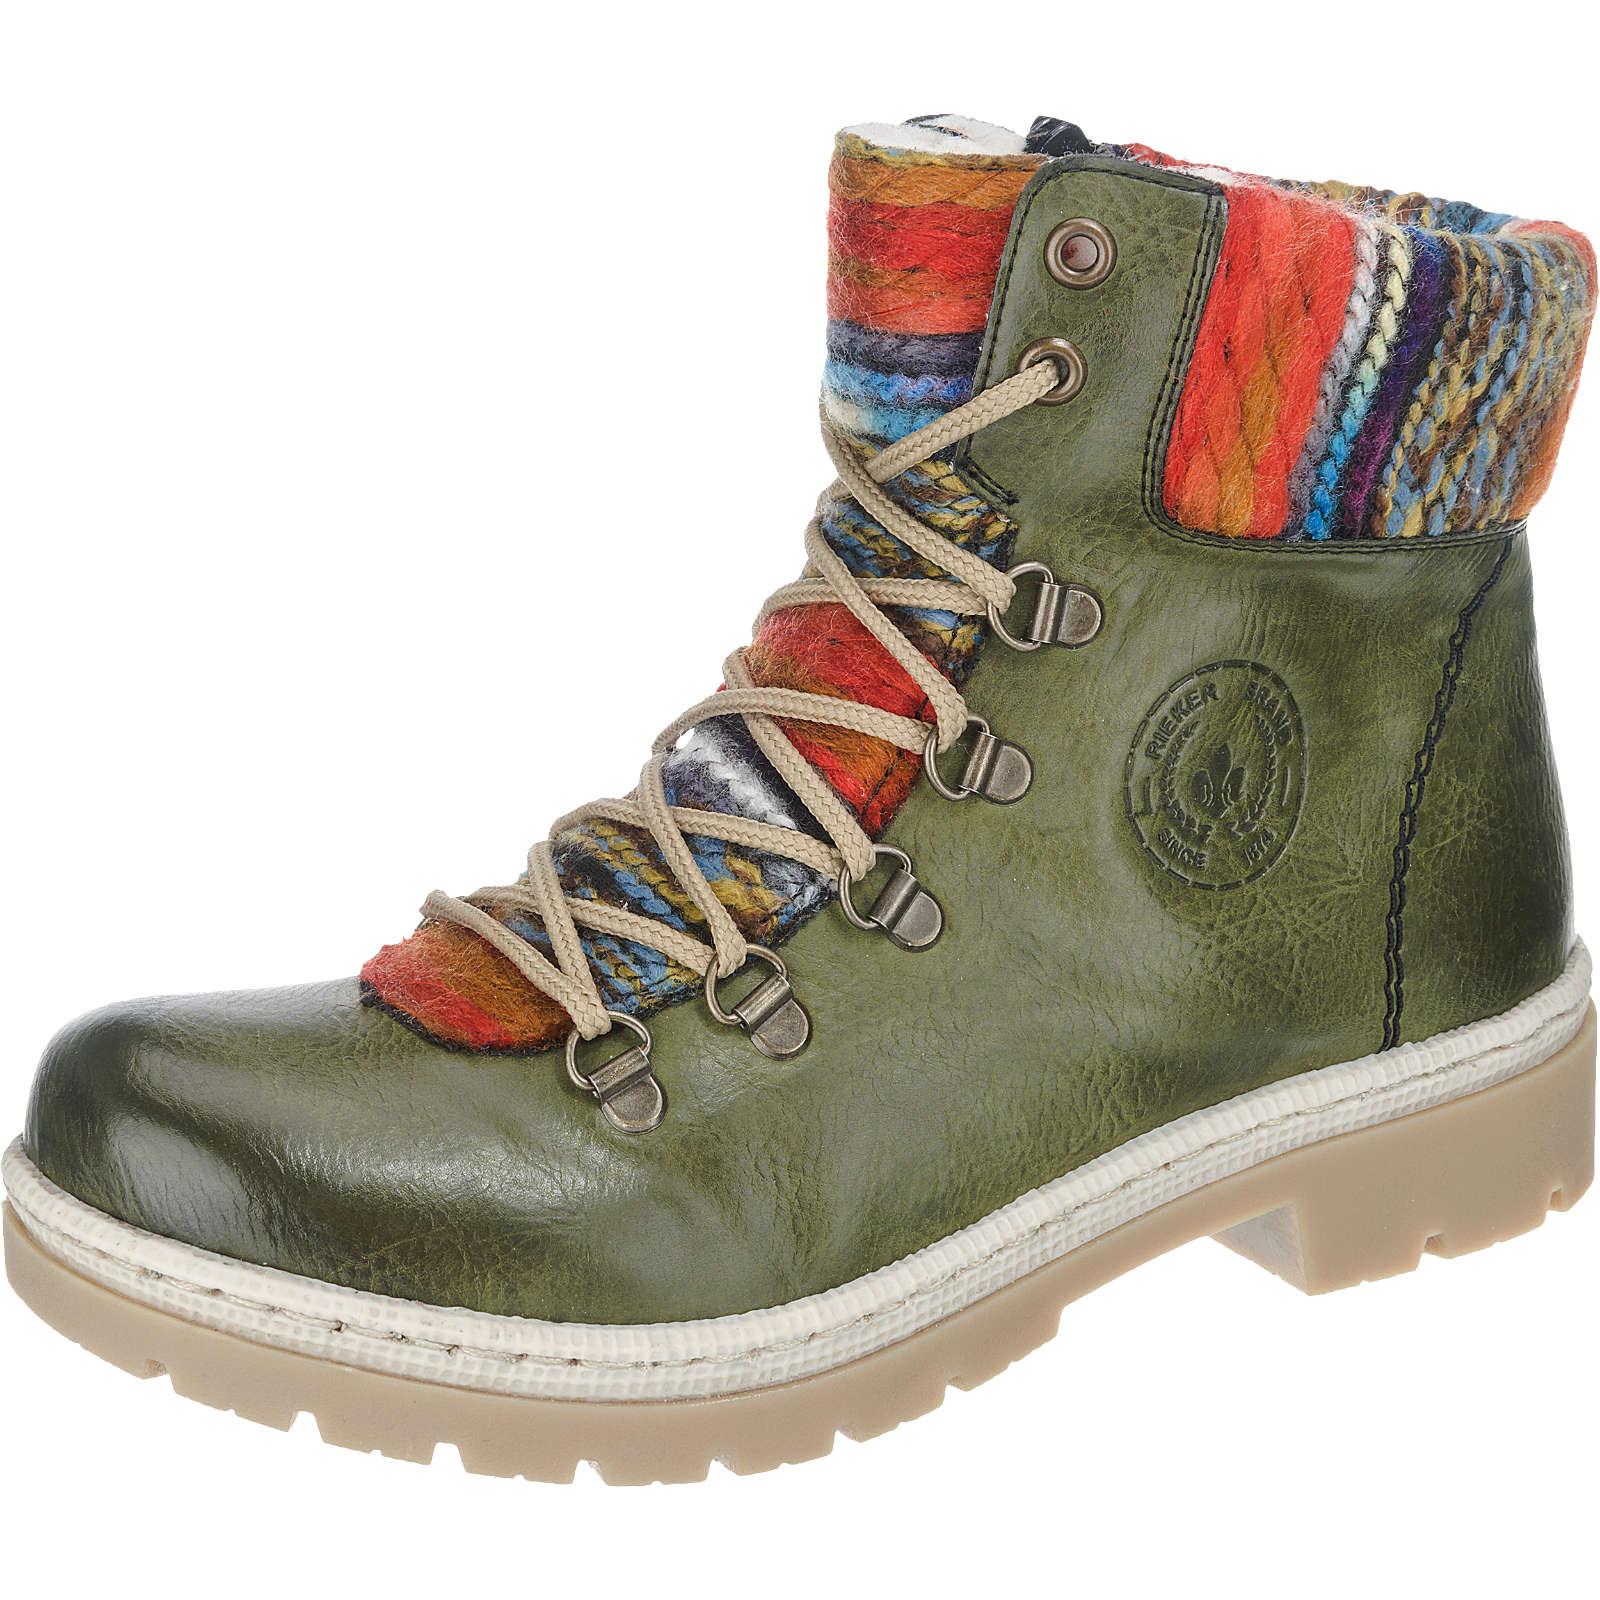 rieker stiefeletten gr n damen gr 39 outlet stiefel boots stiefeletten. Black Bedroom Furniture Sets. Home Design Ideas